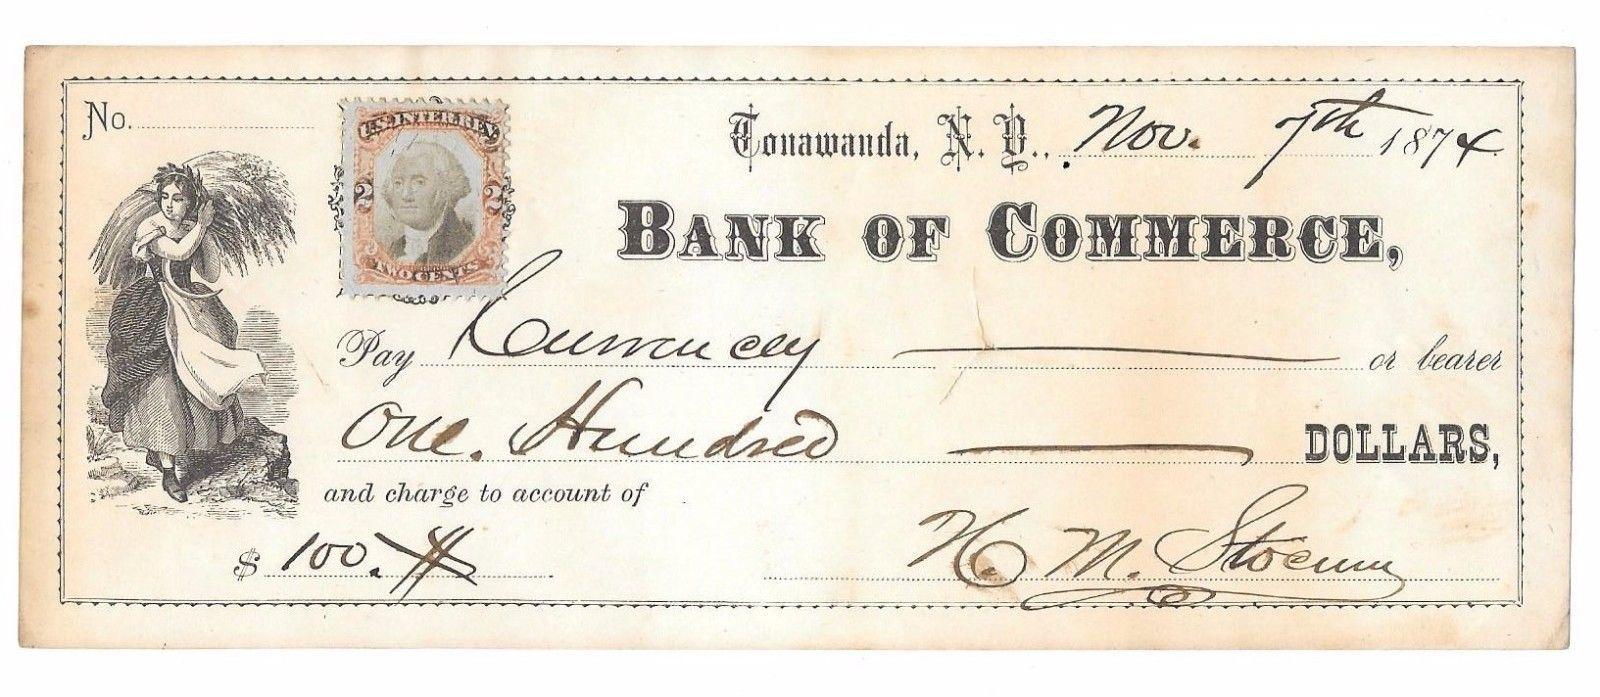 Bank of Commerce, Tonawanda, H.M. Stocum, check (1874-11-07).jpg